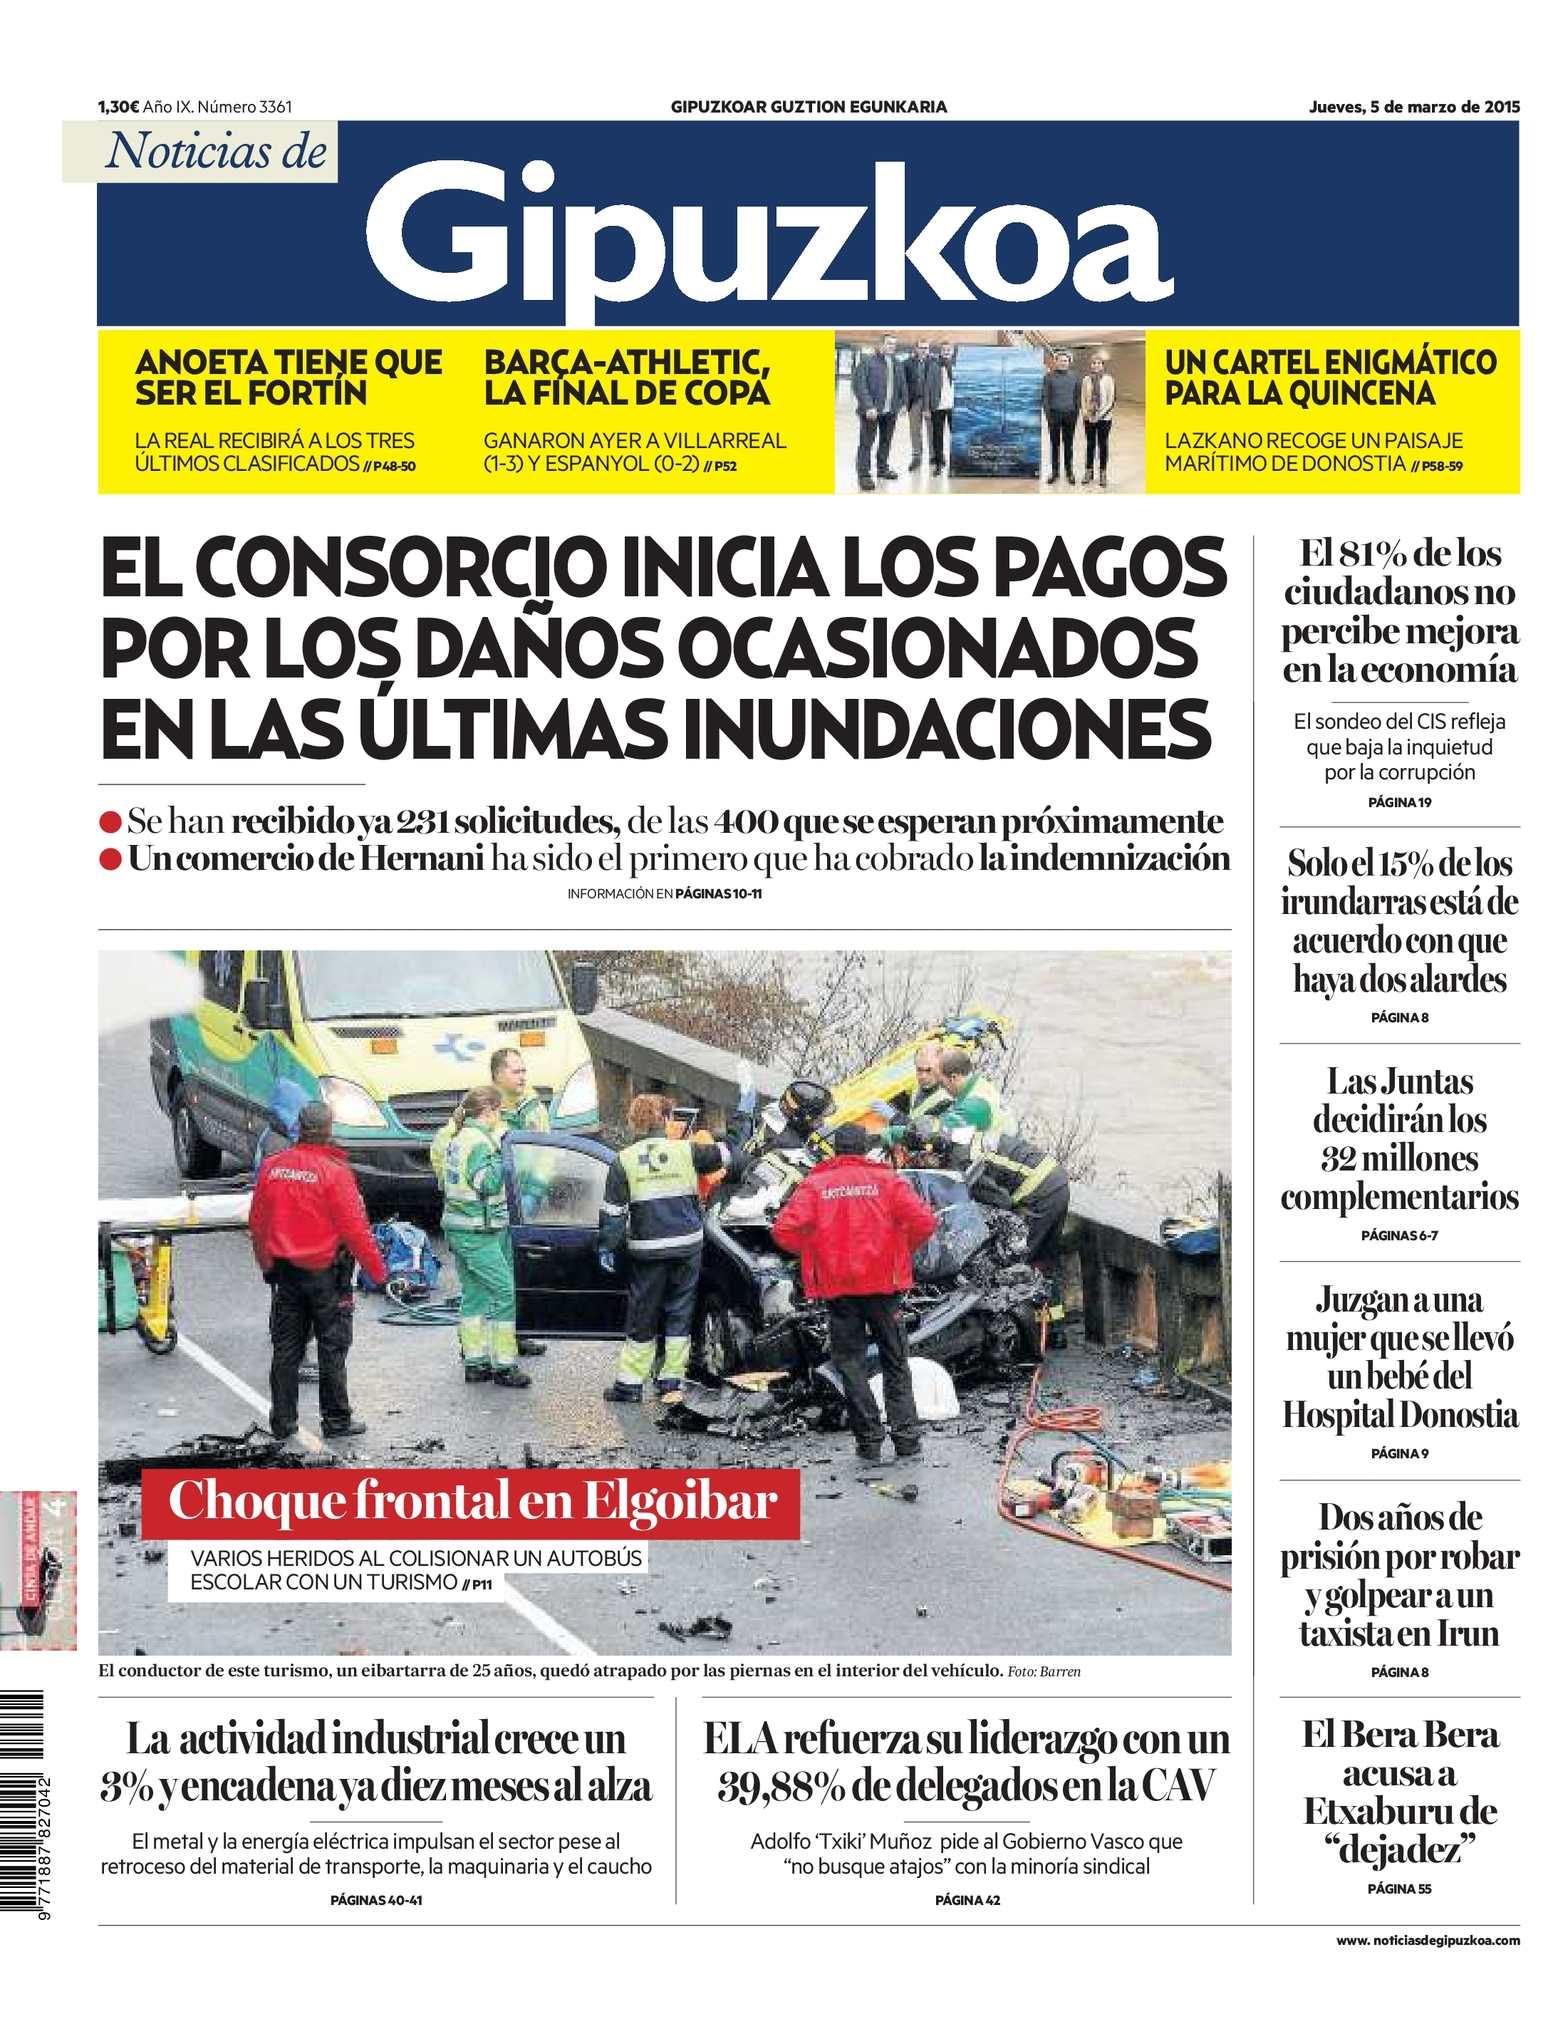 Calaméo - Noticias de Gipuzkoa 20150305 695c3e1643f0